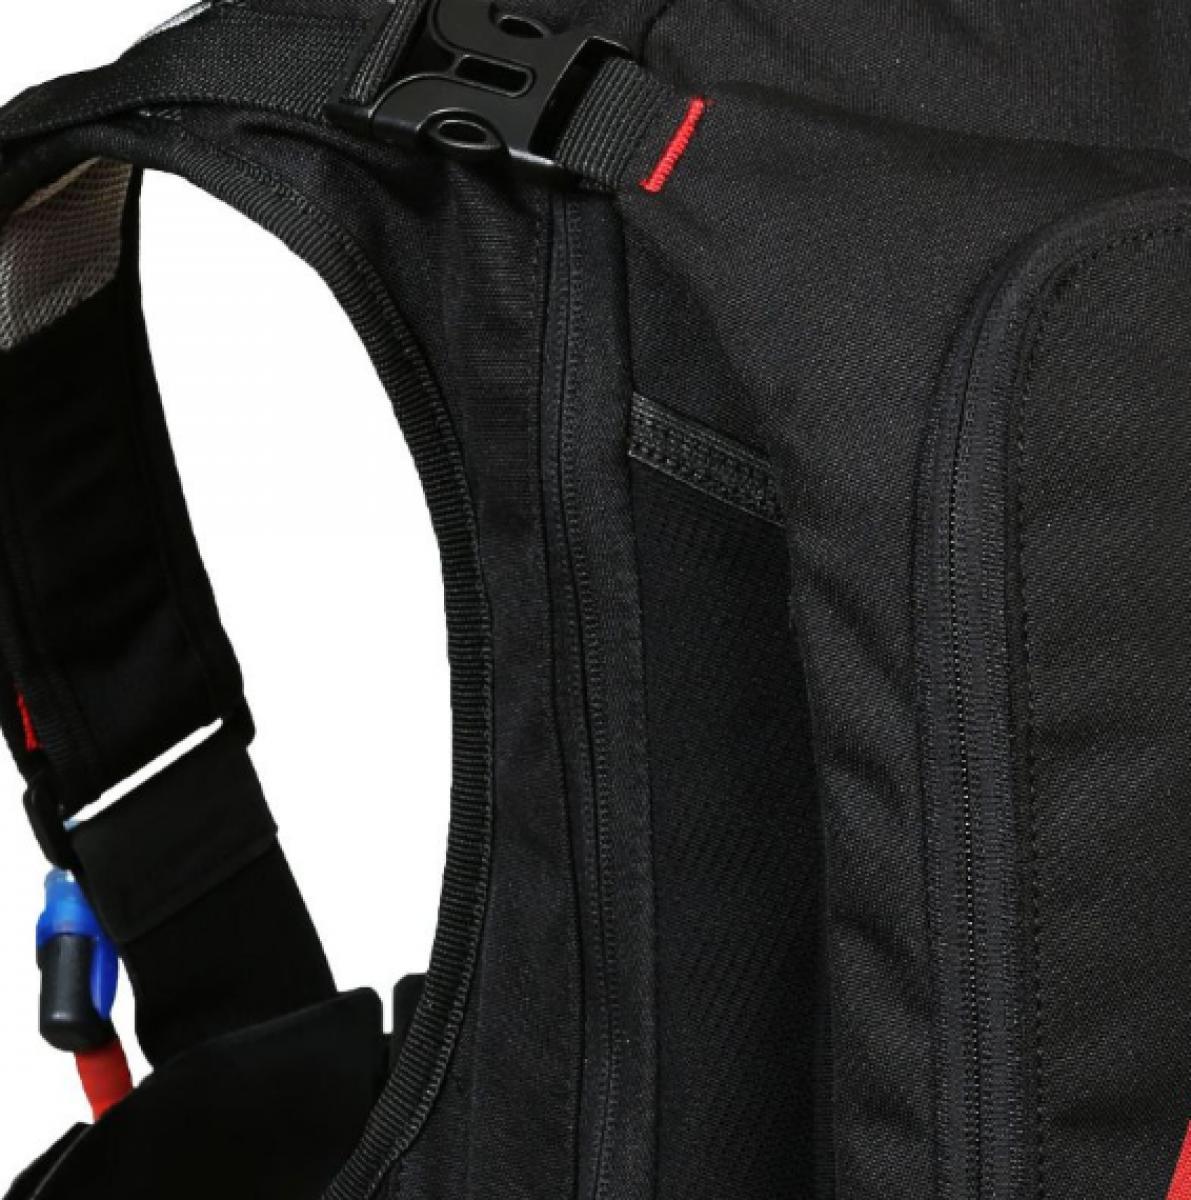 * USWE F6 PRO Hydropack